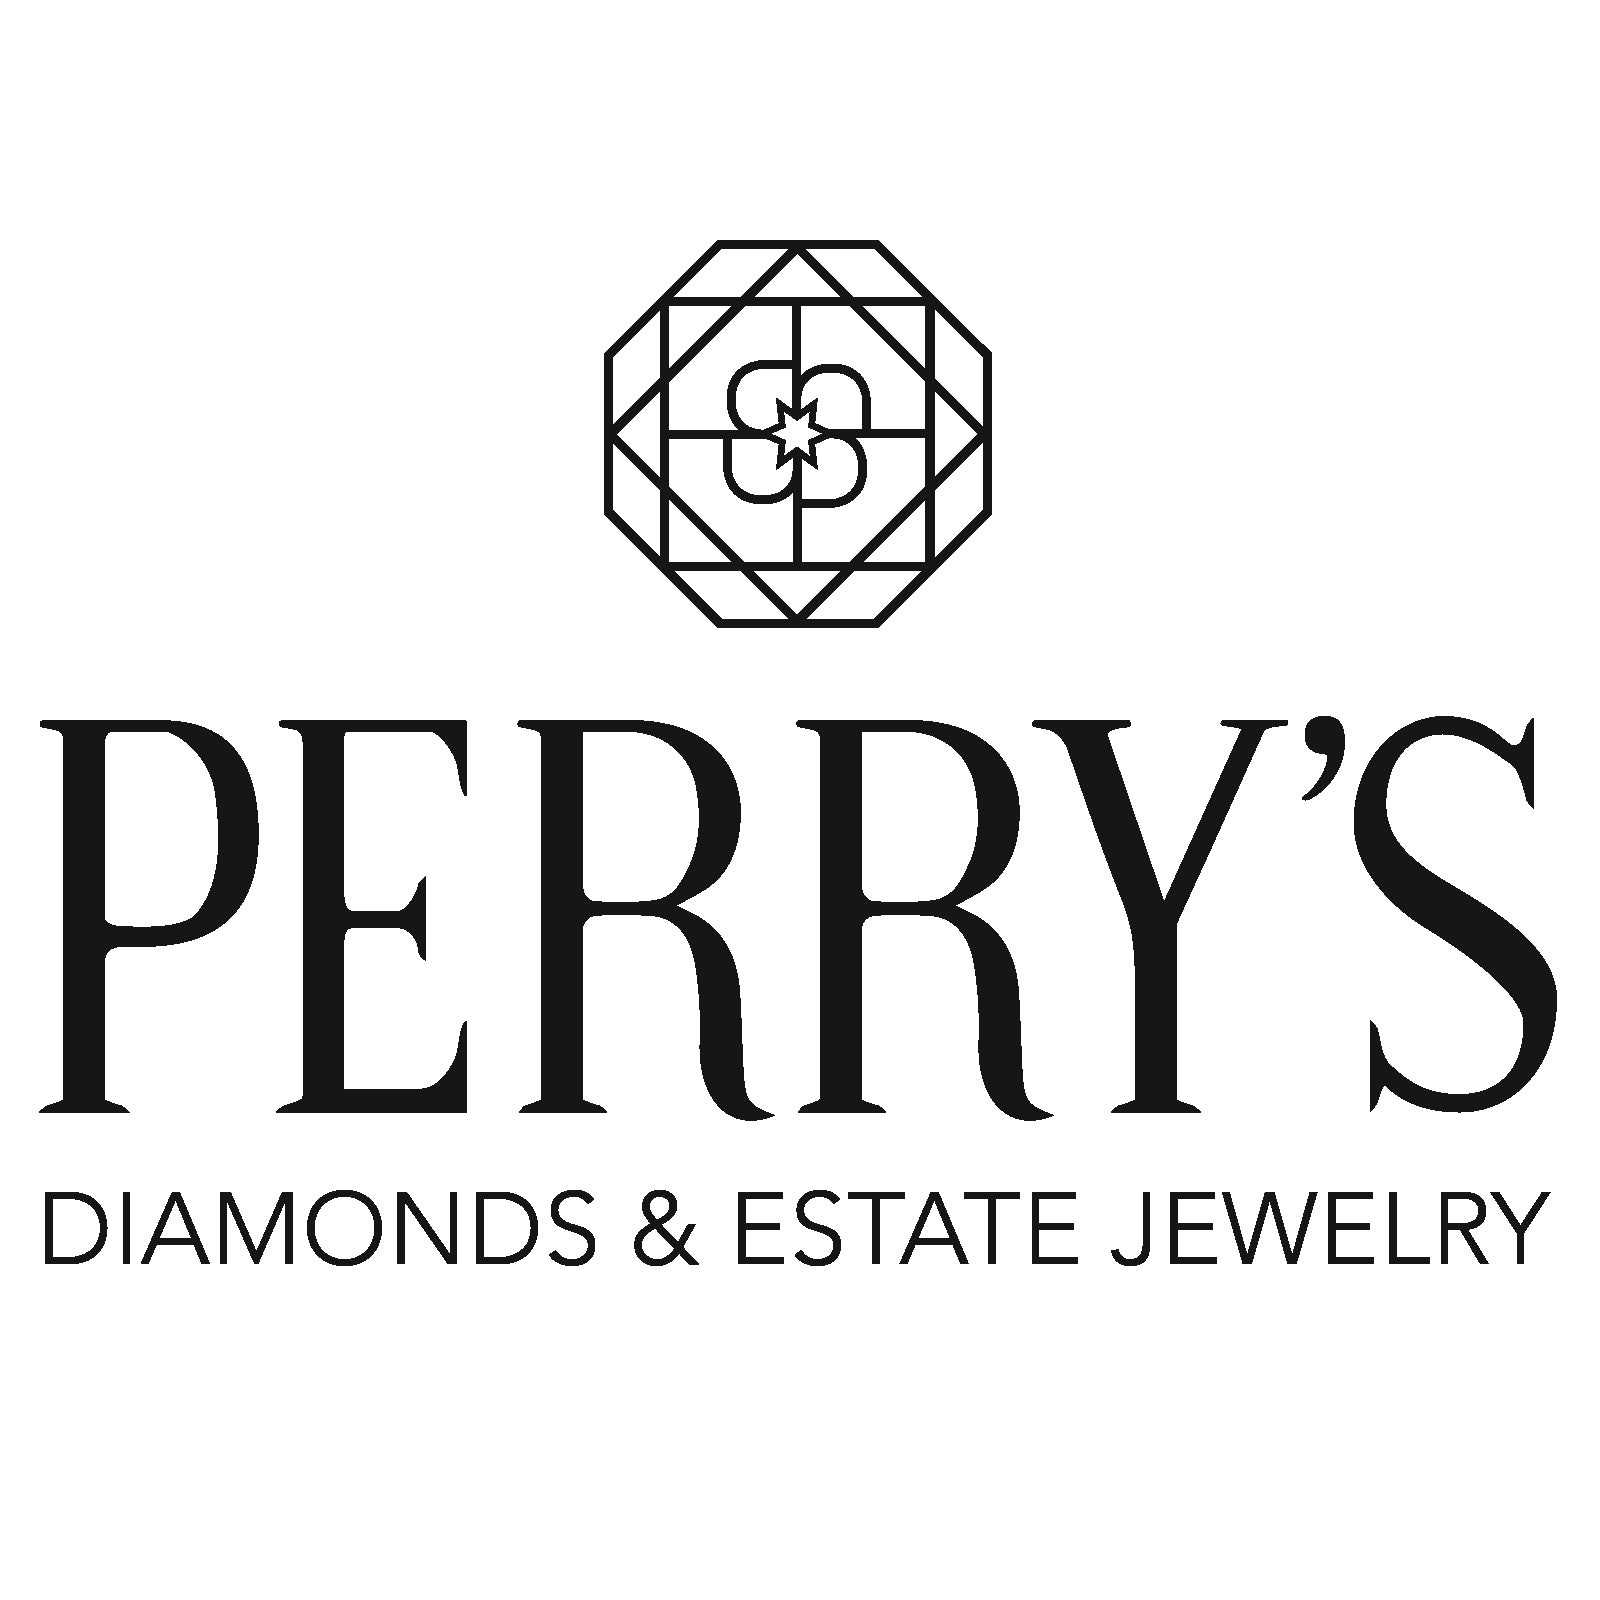 Perry's Diamonds & Estate Jewelry